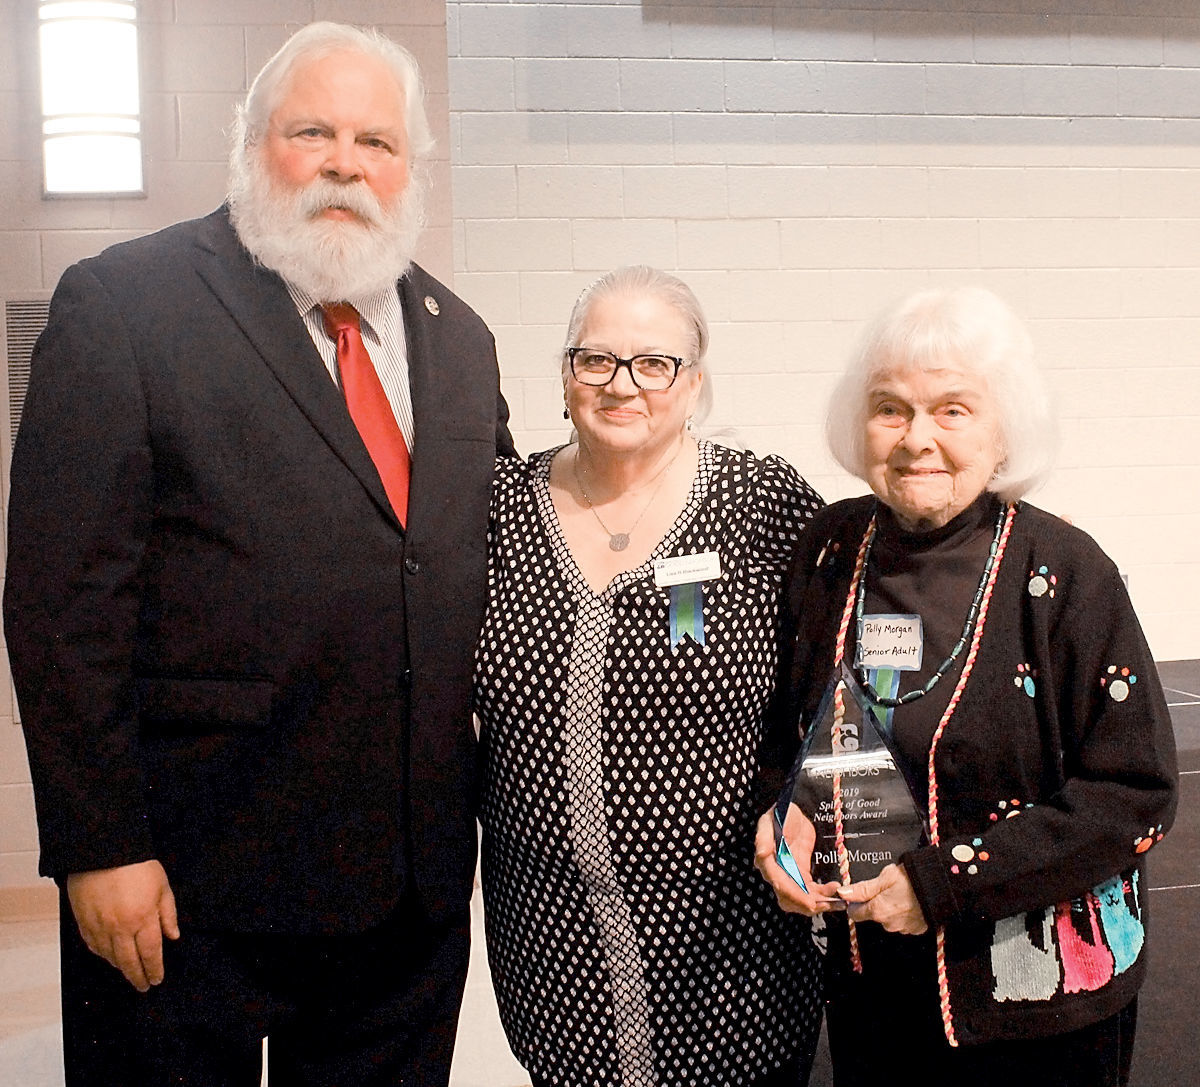 Mayor Ed Mitchell, Lisa Blackwood and Polly Morgan